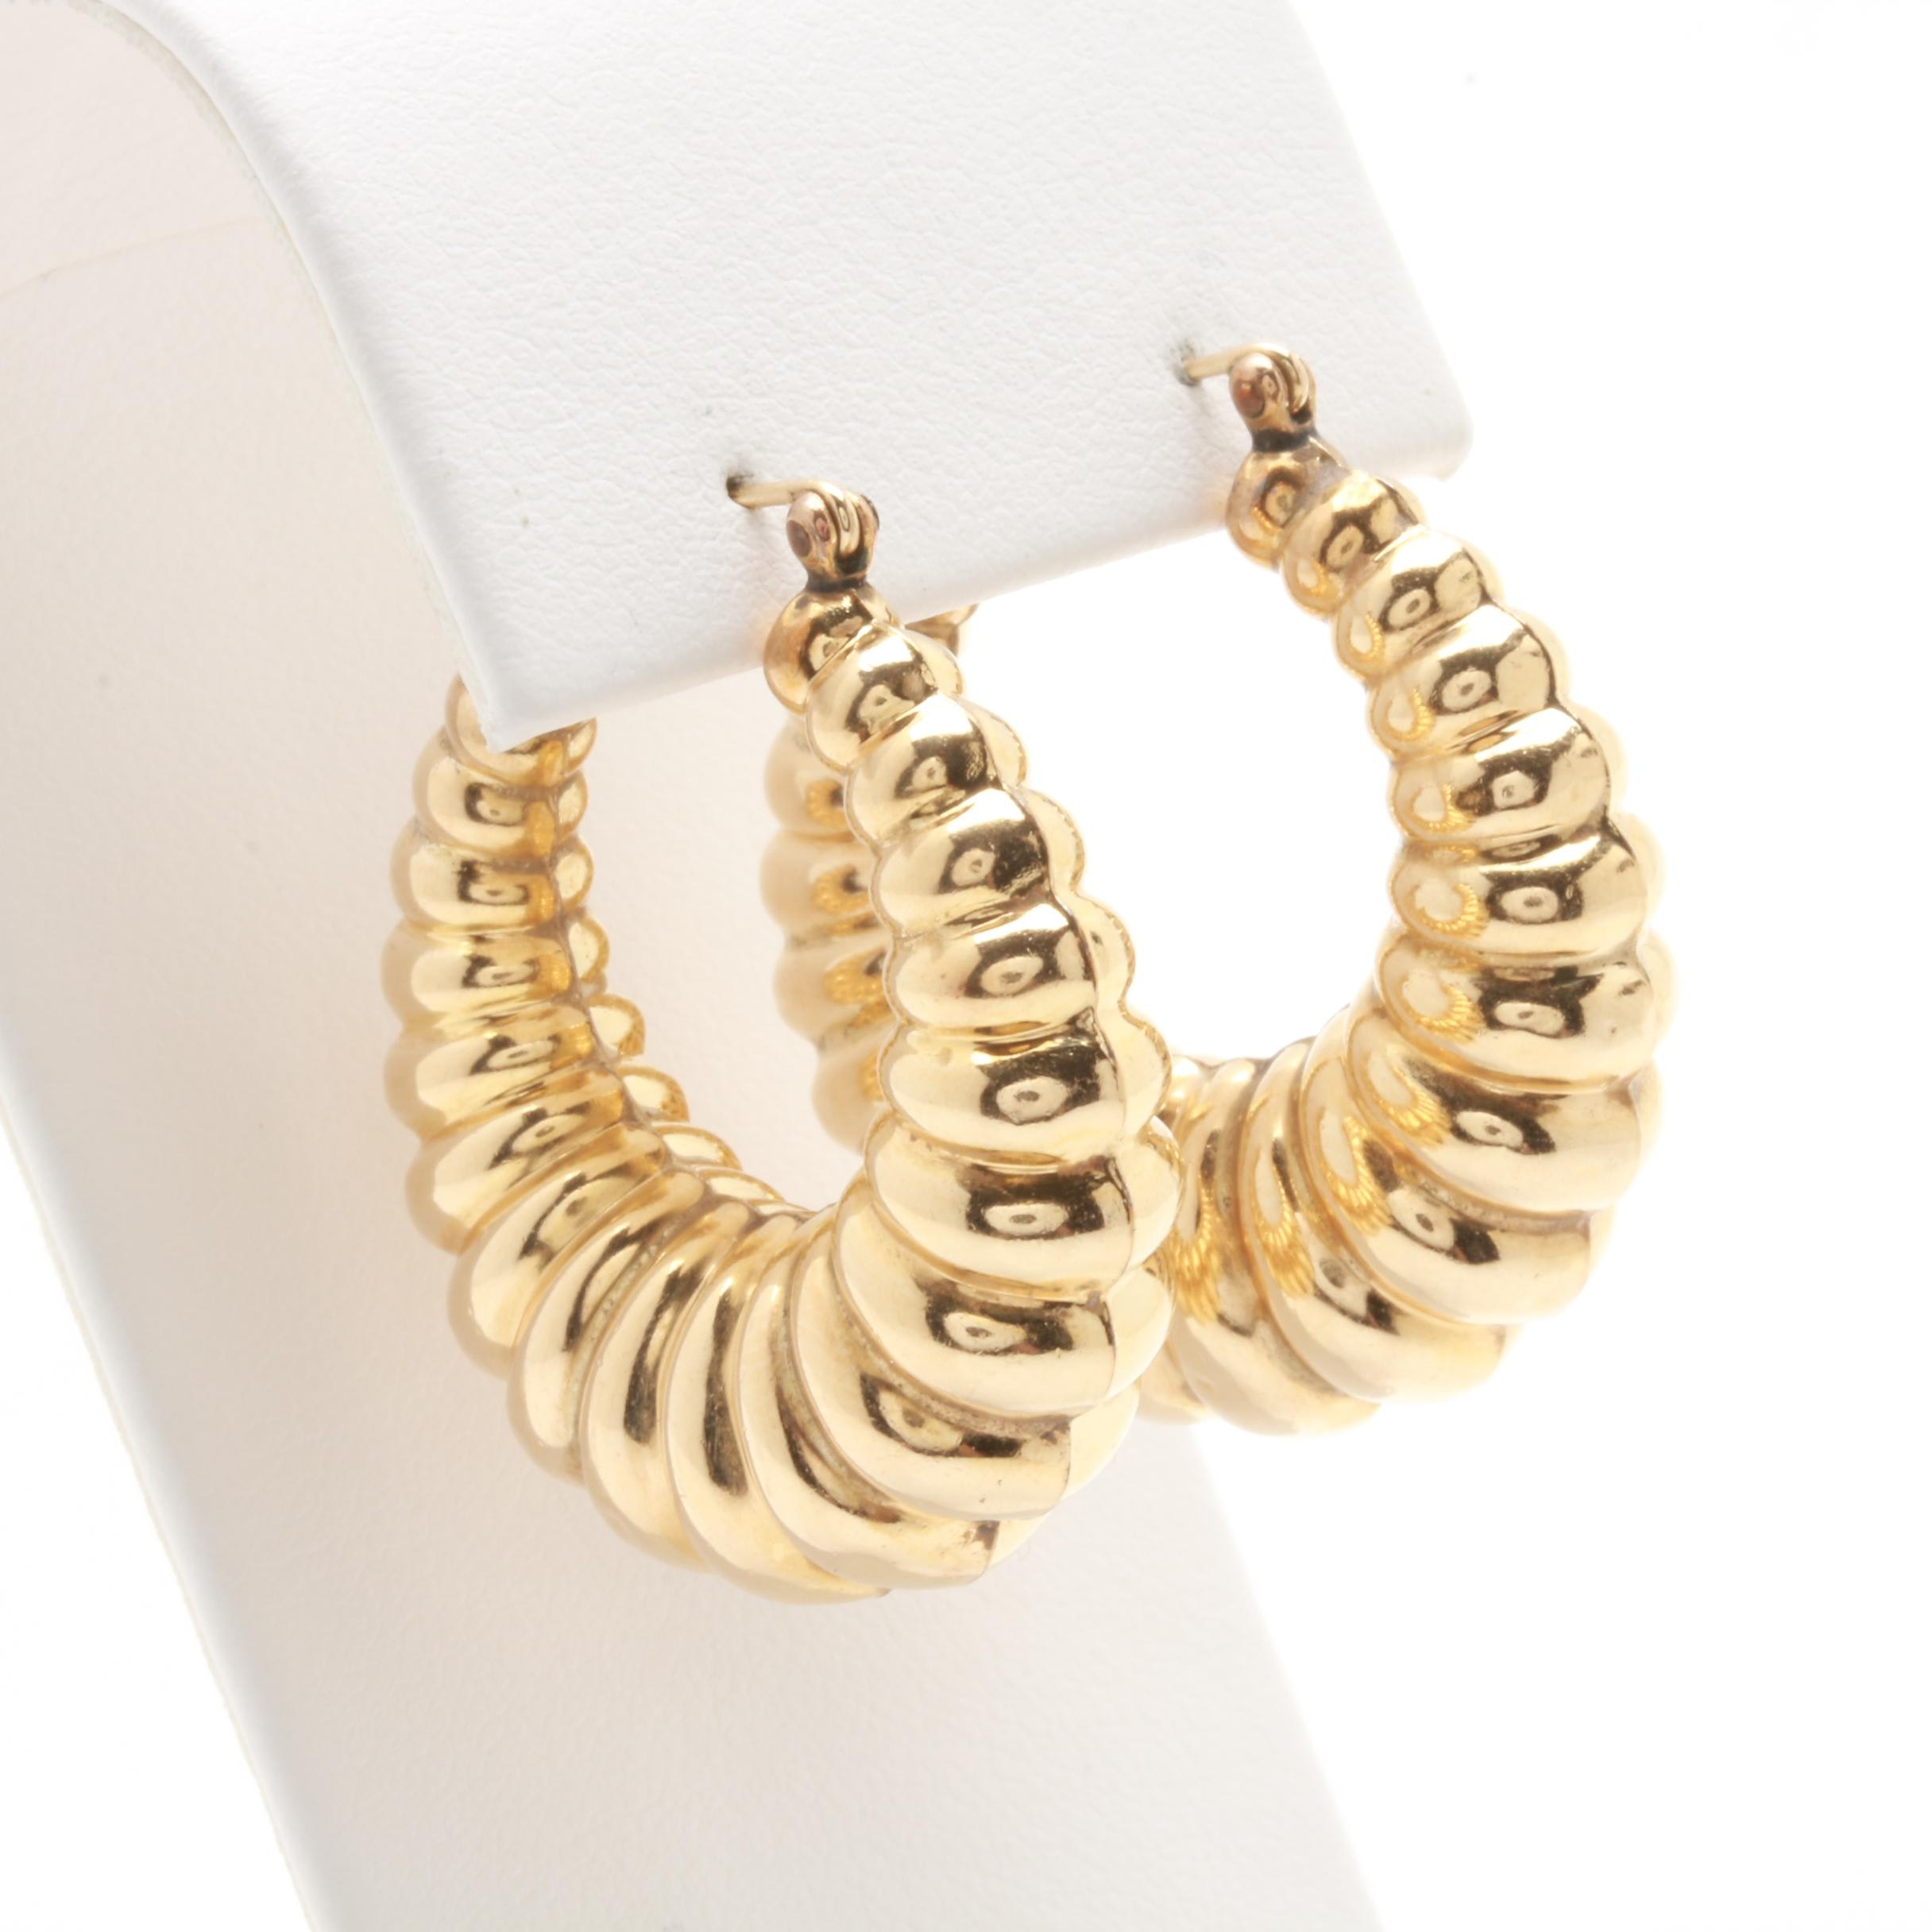 14K Yellow Gold Beveled Hoop Earrings